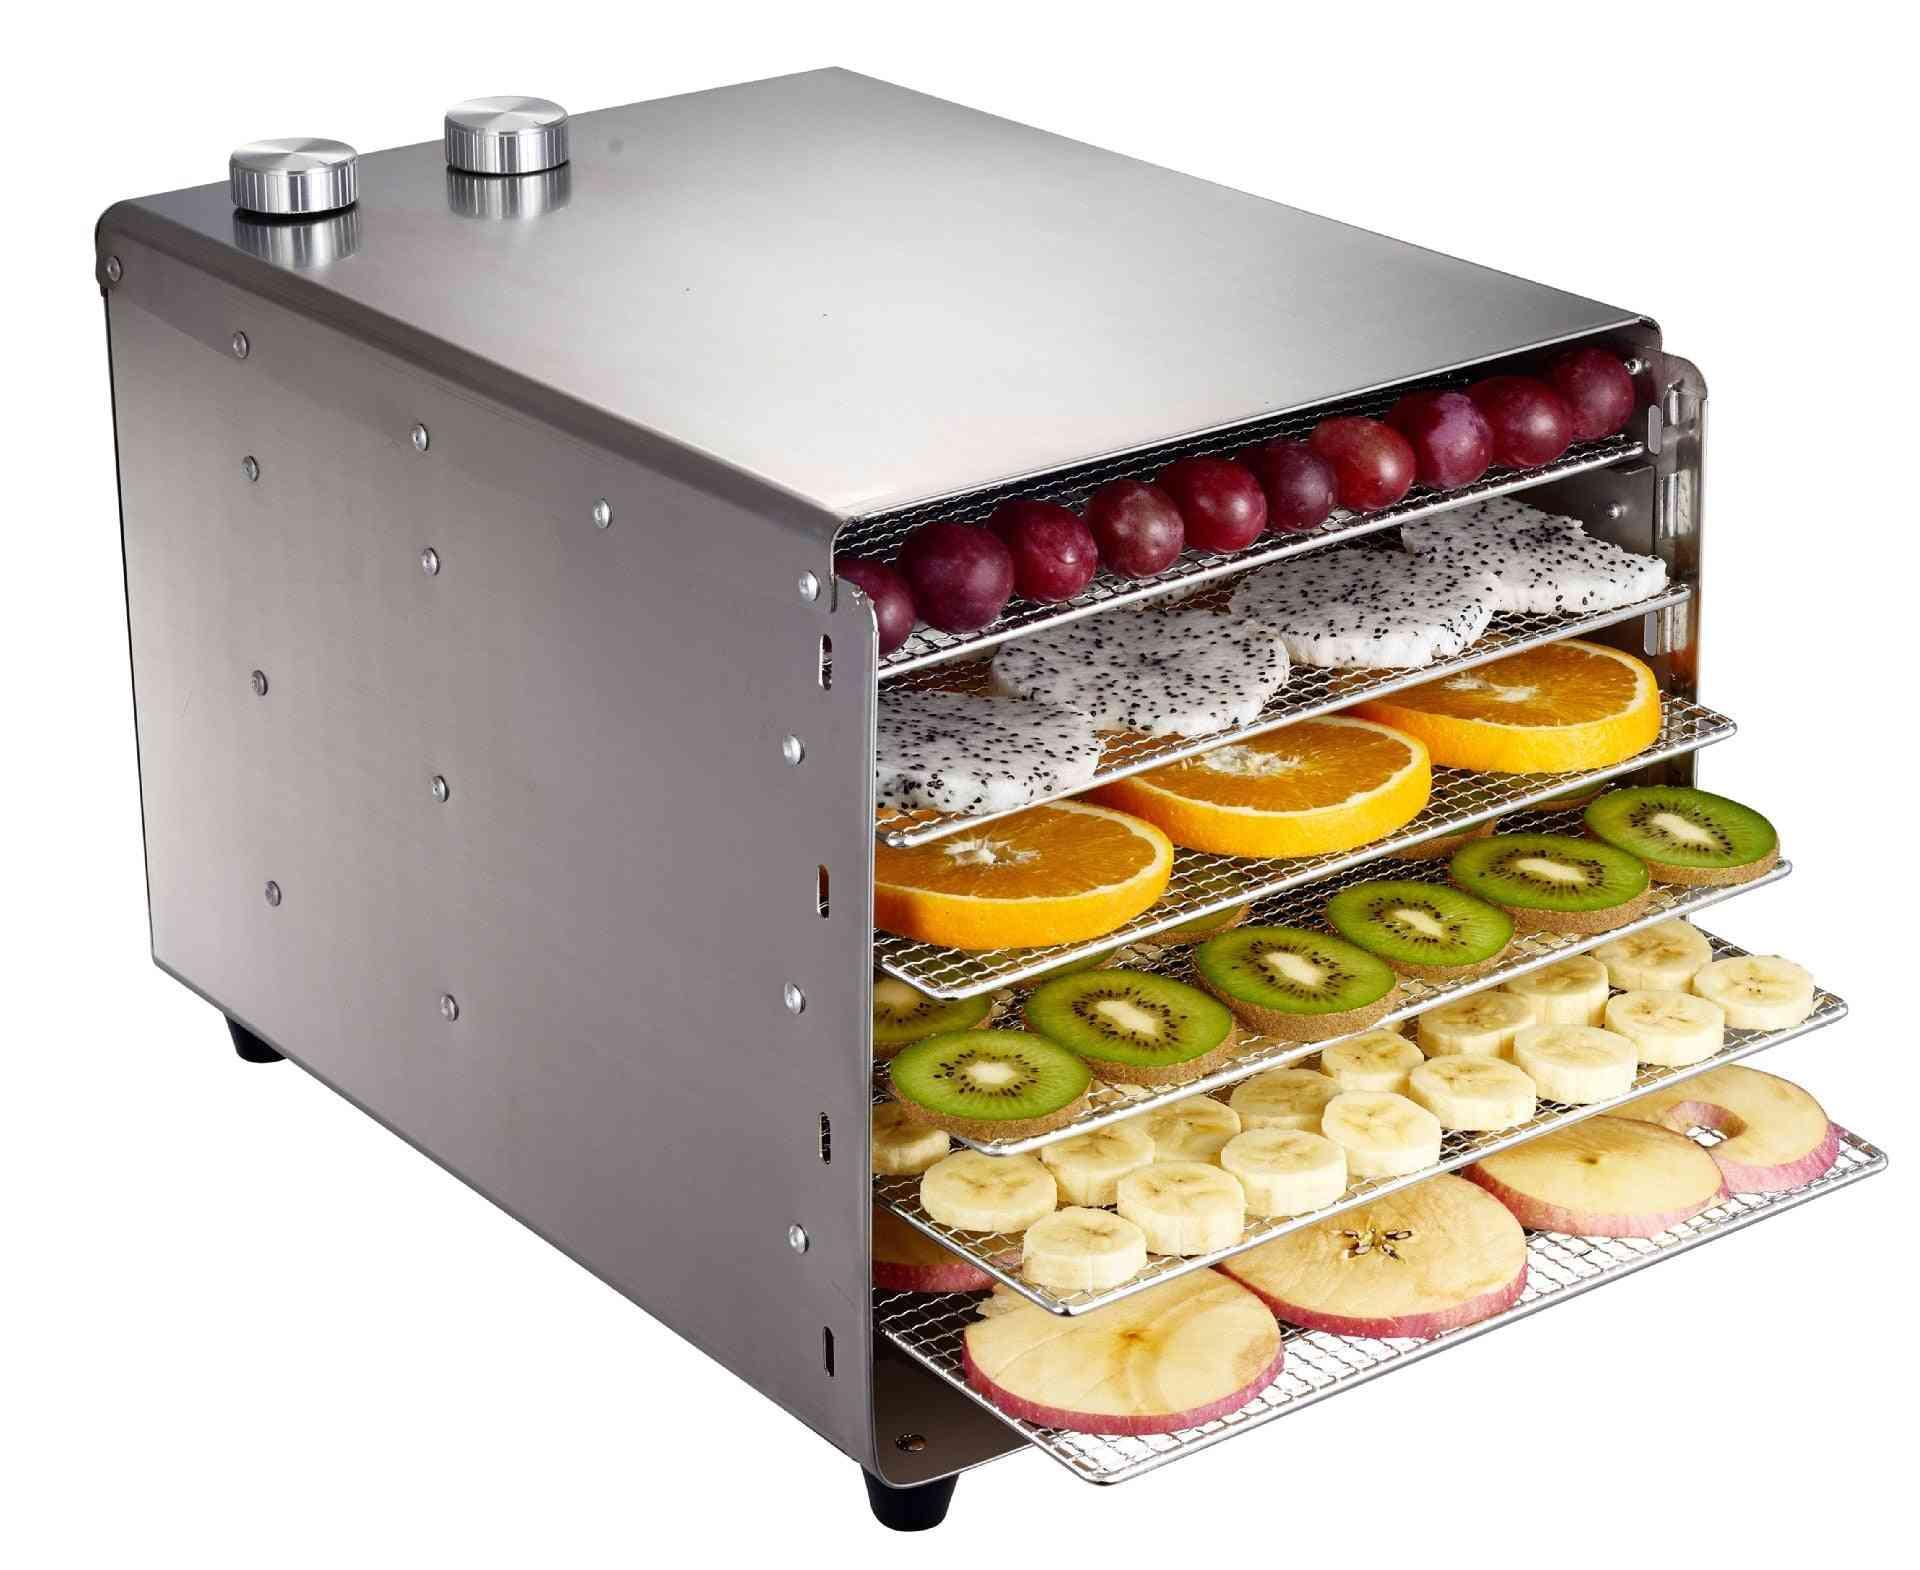 Stainless Steel Food Dehydrator For Mushroom, Fruit & Vegetable Dryer Meat Machine